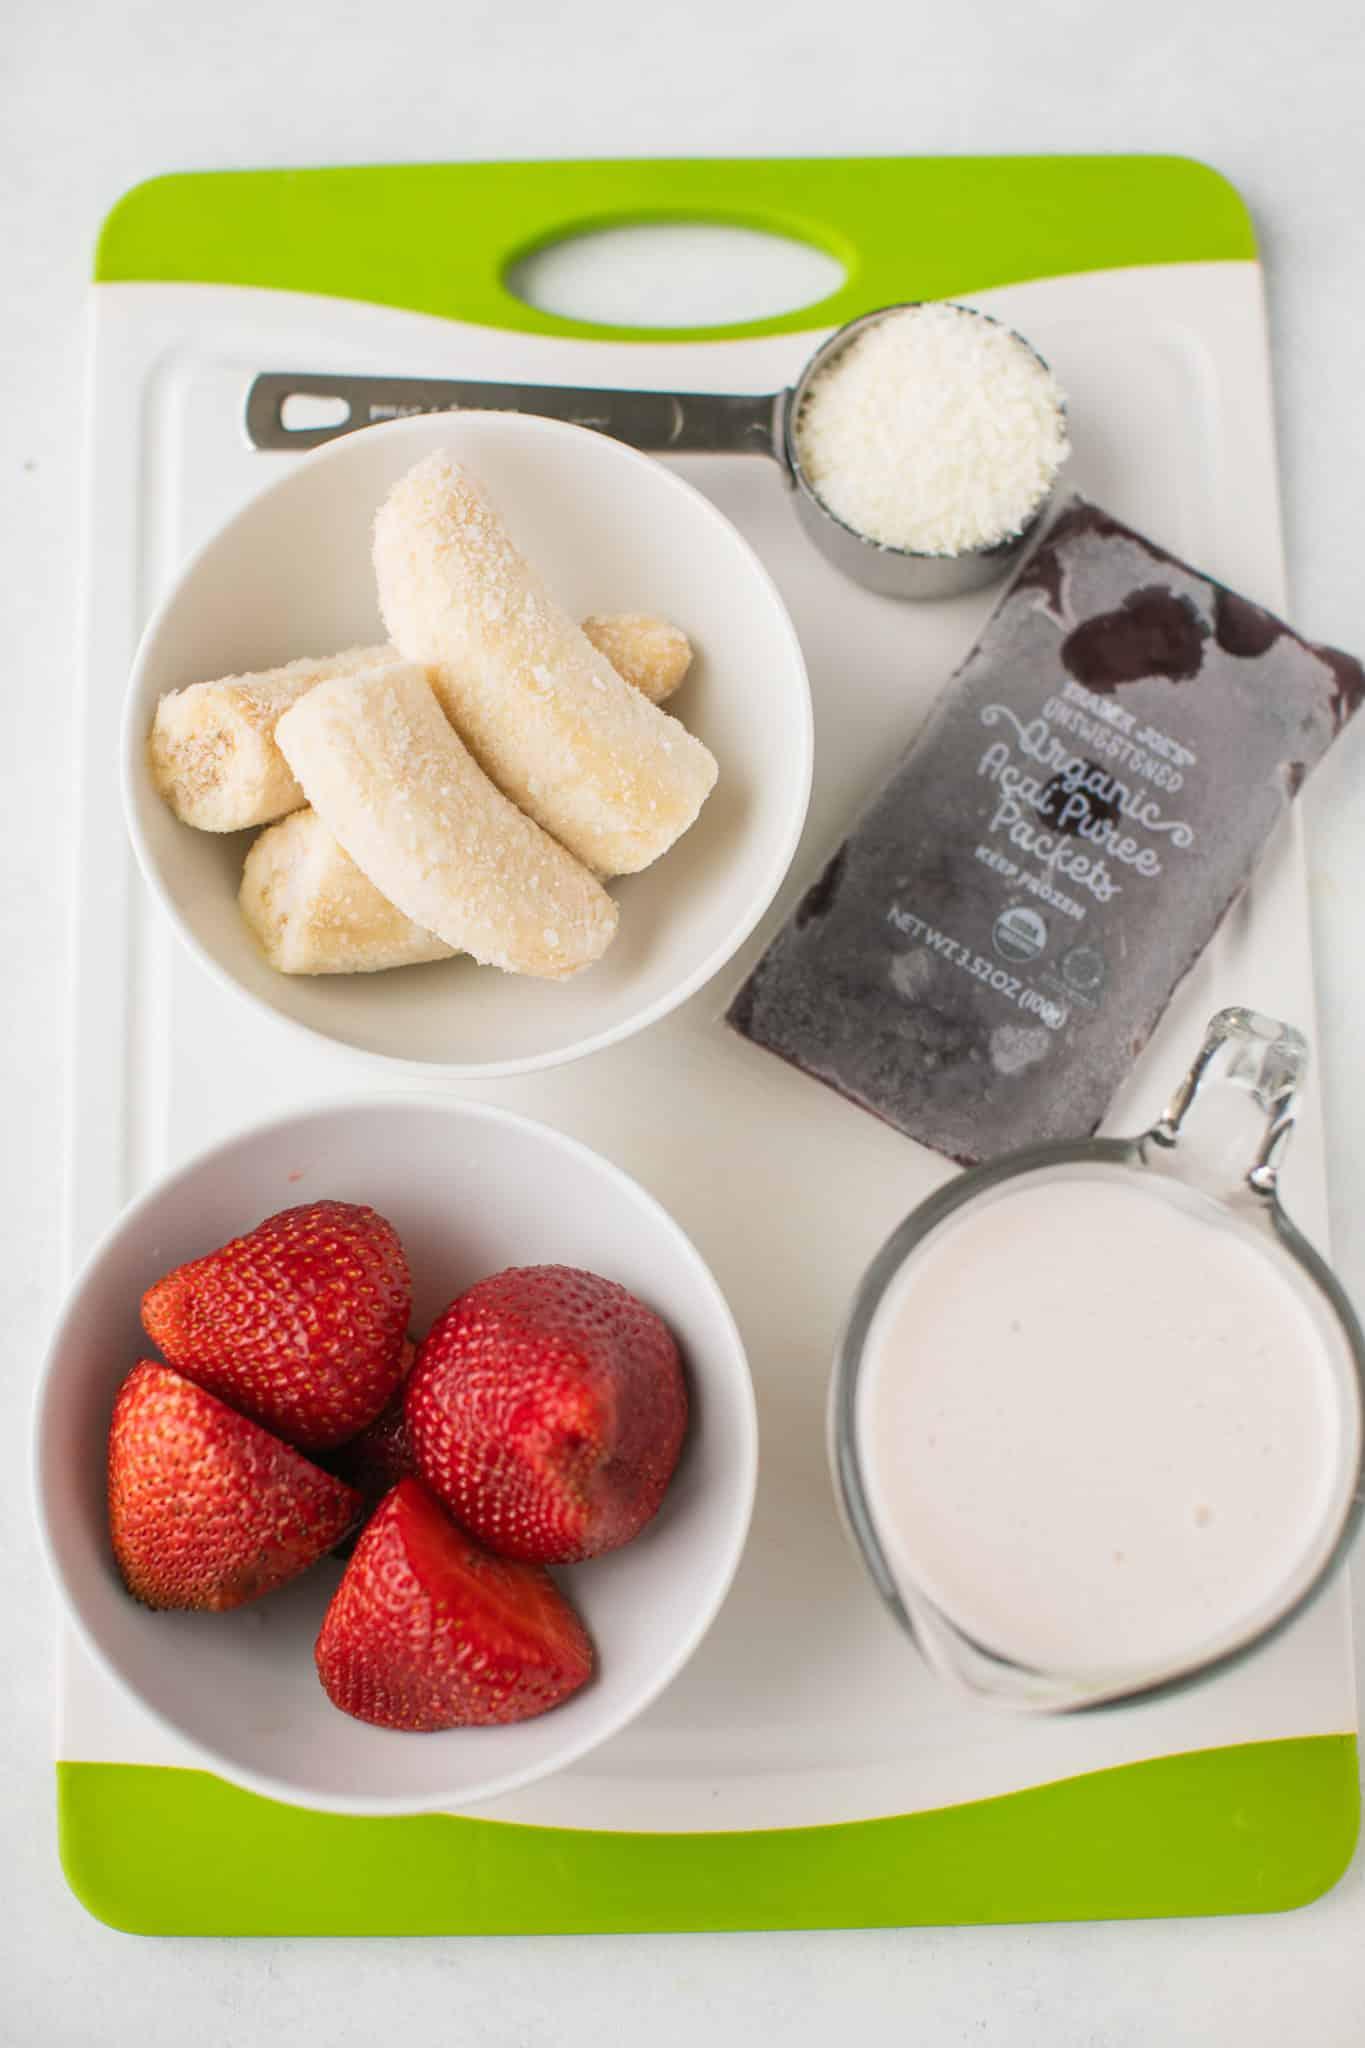 acai smoothie ingredients